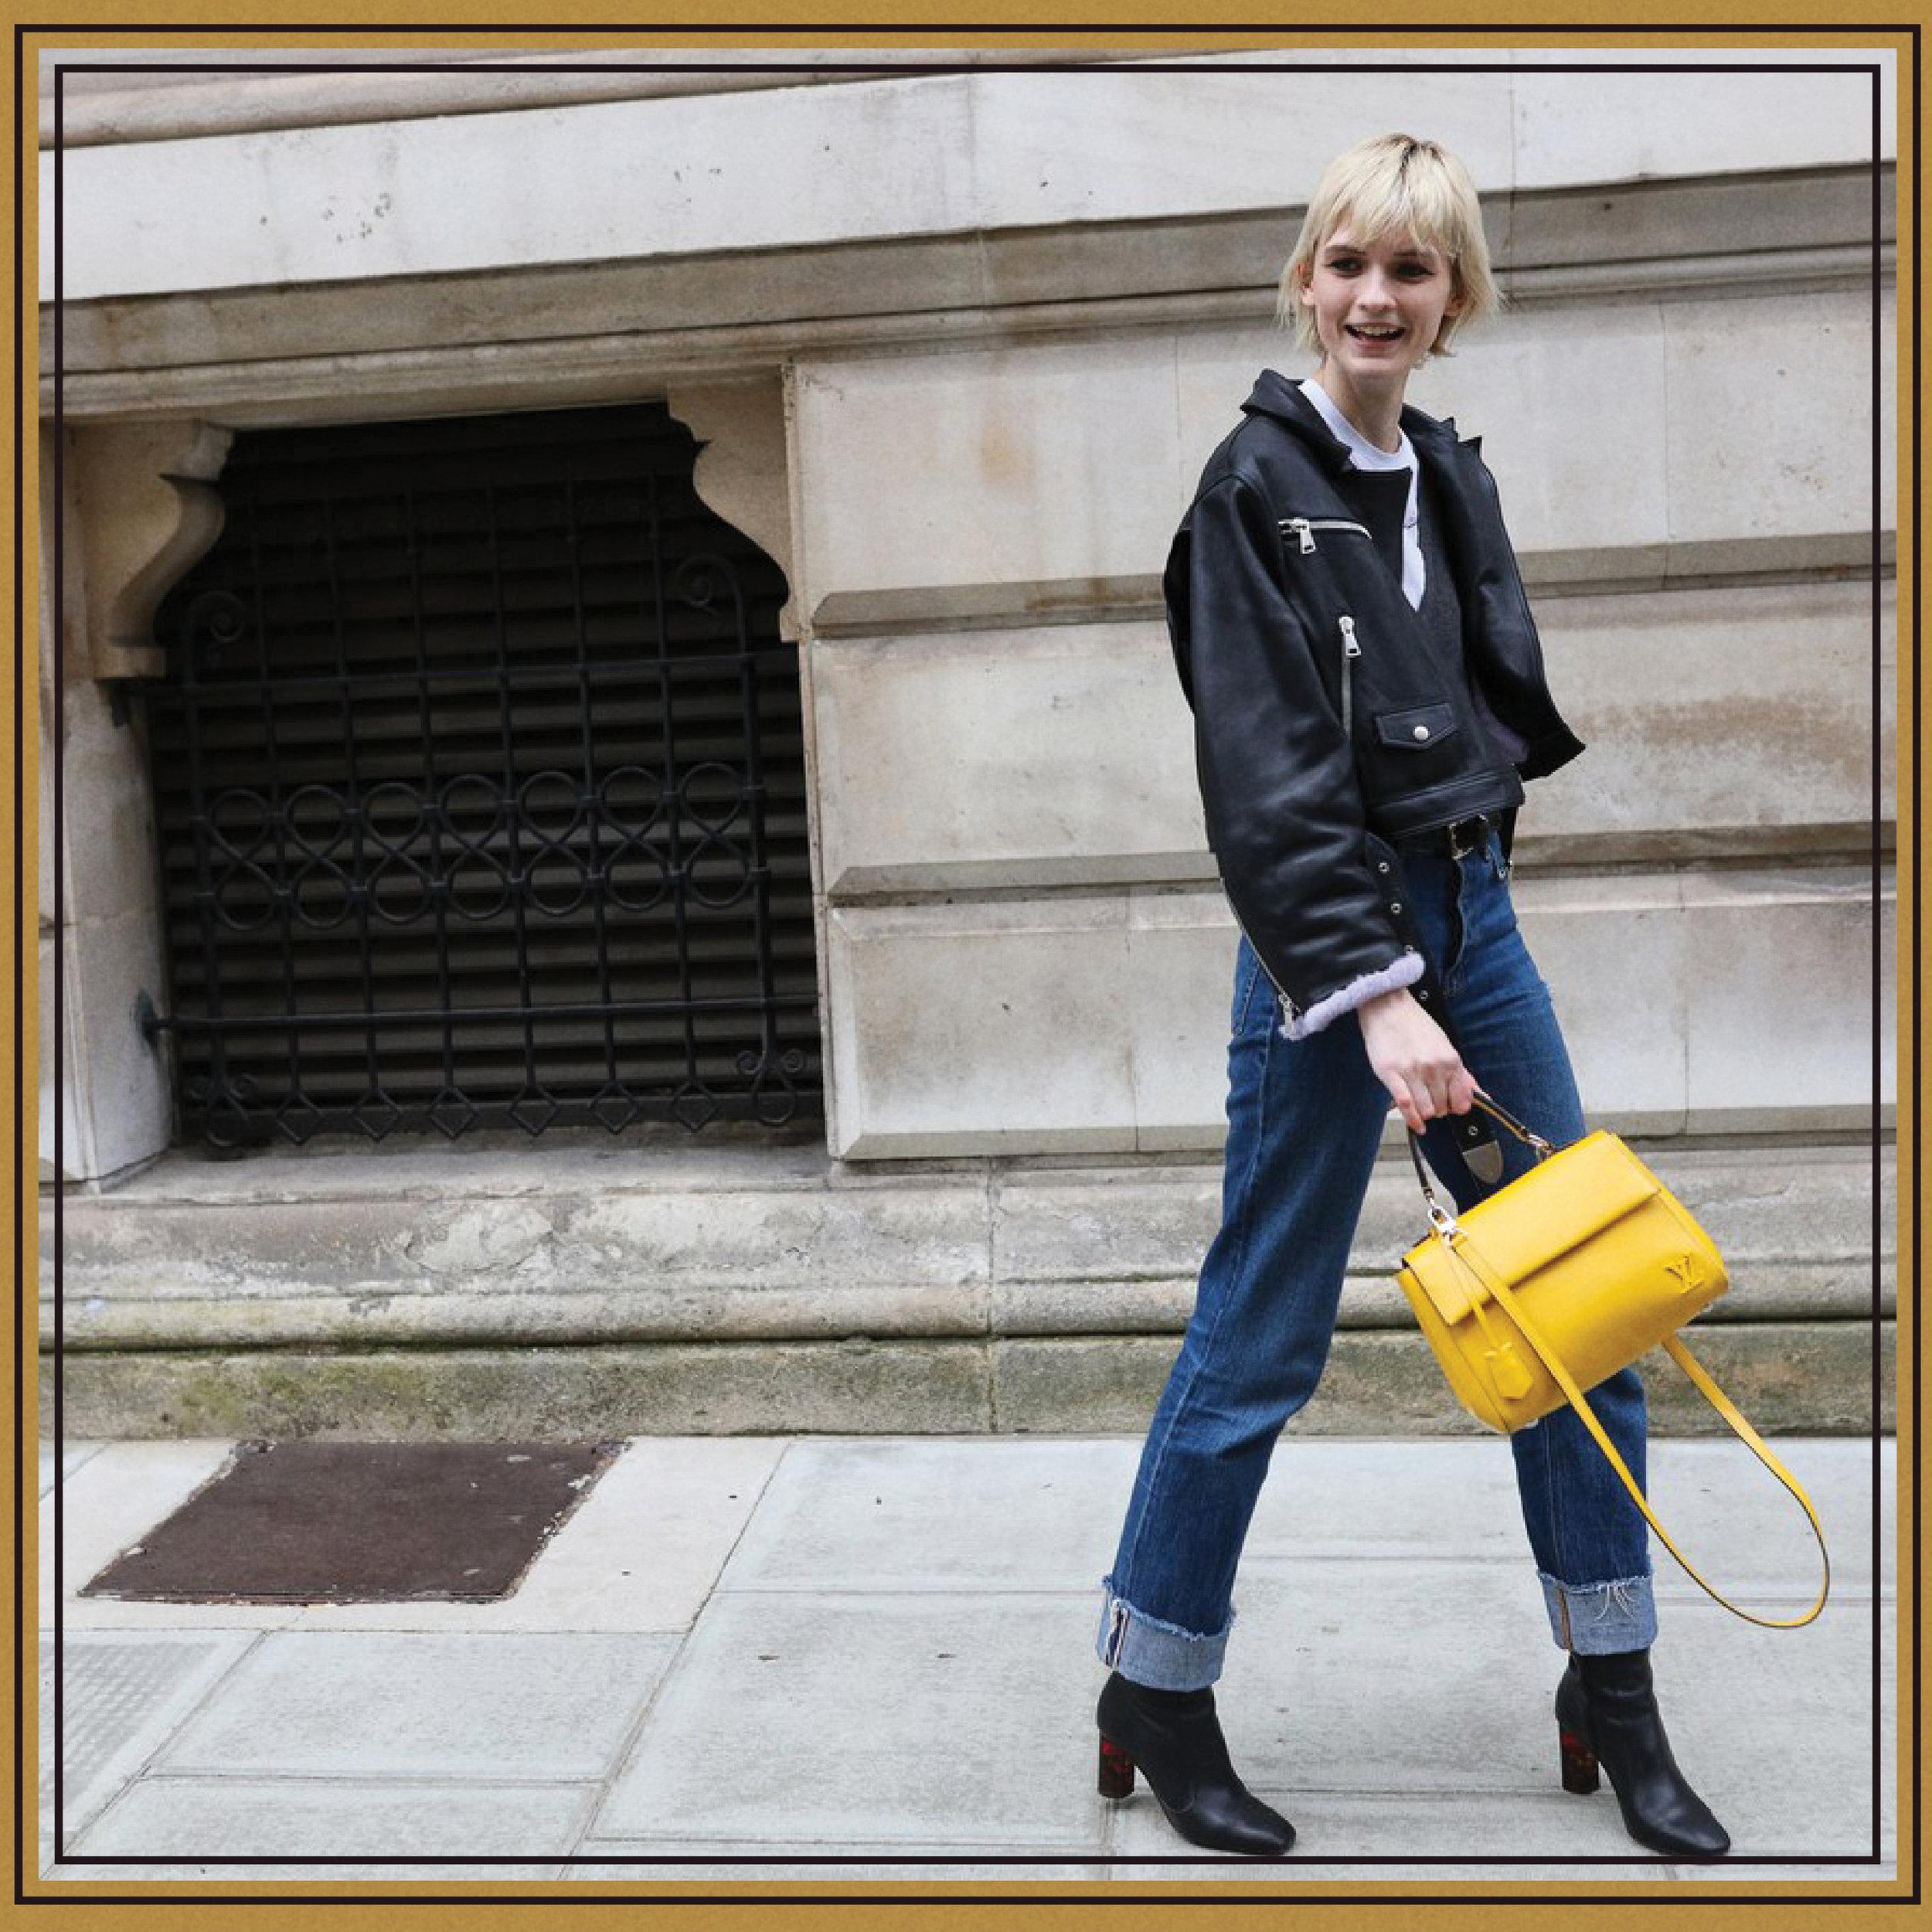 Lara Mullen with a Louis Vuitton bag